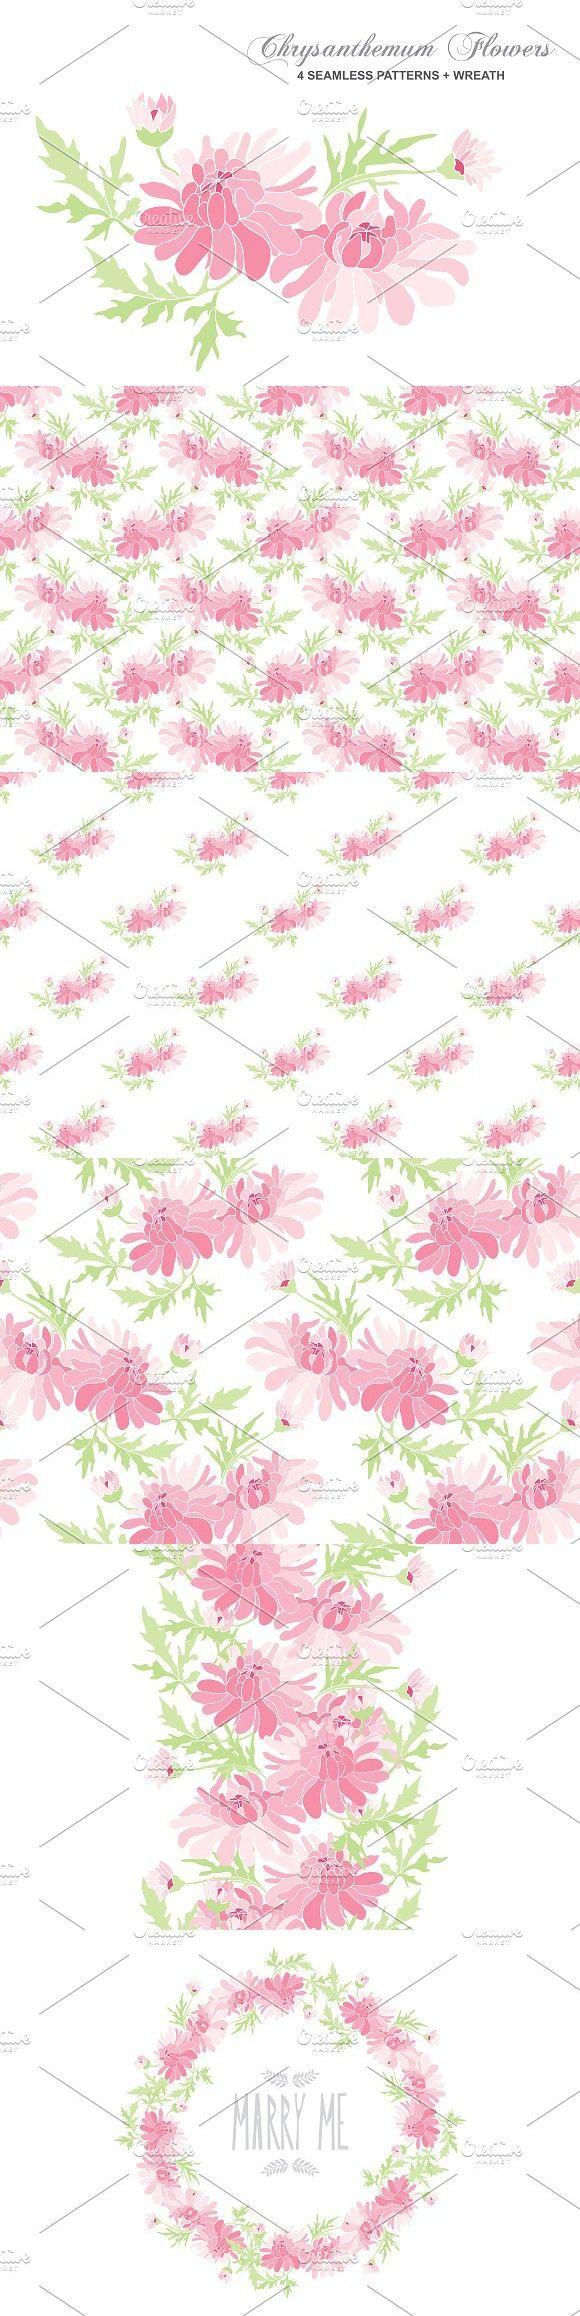 Chrysanthemum Bouquet + Patterns. Wedding Card Templates. $5.00